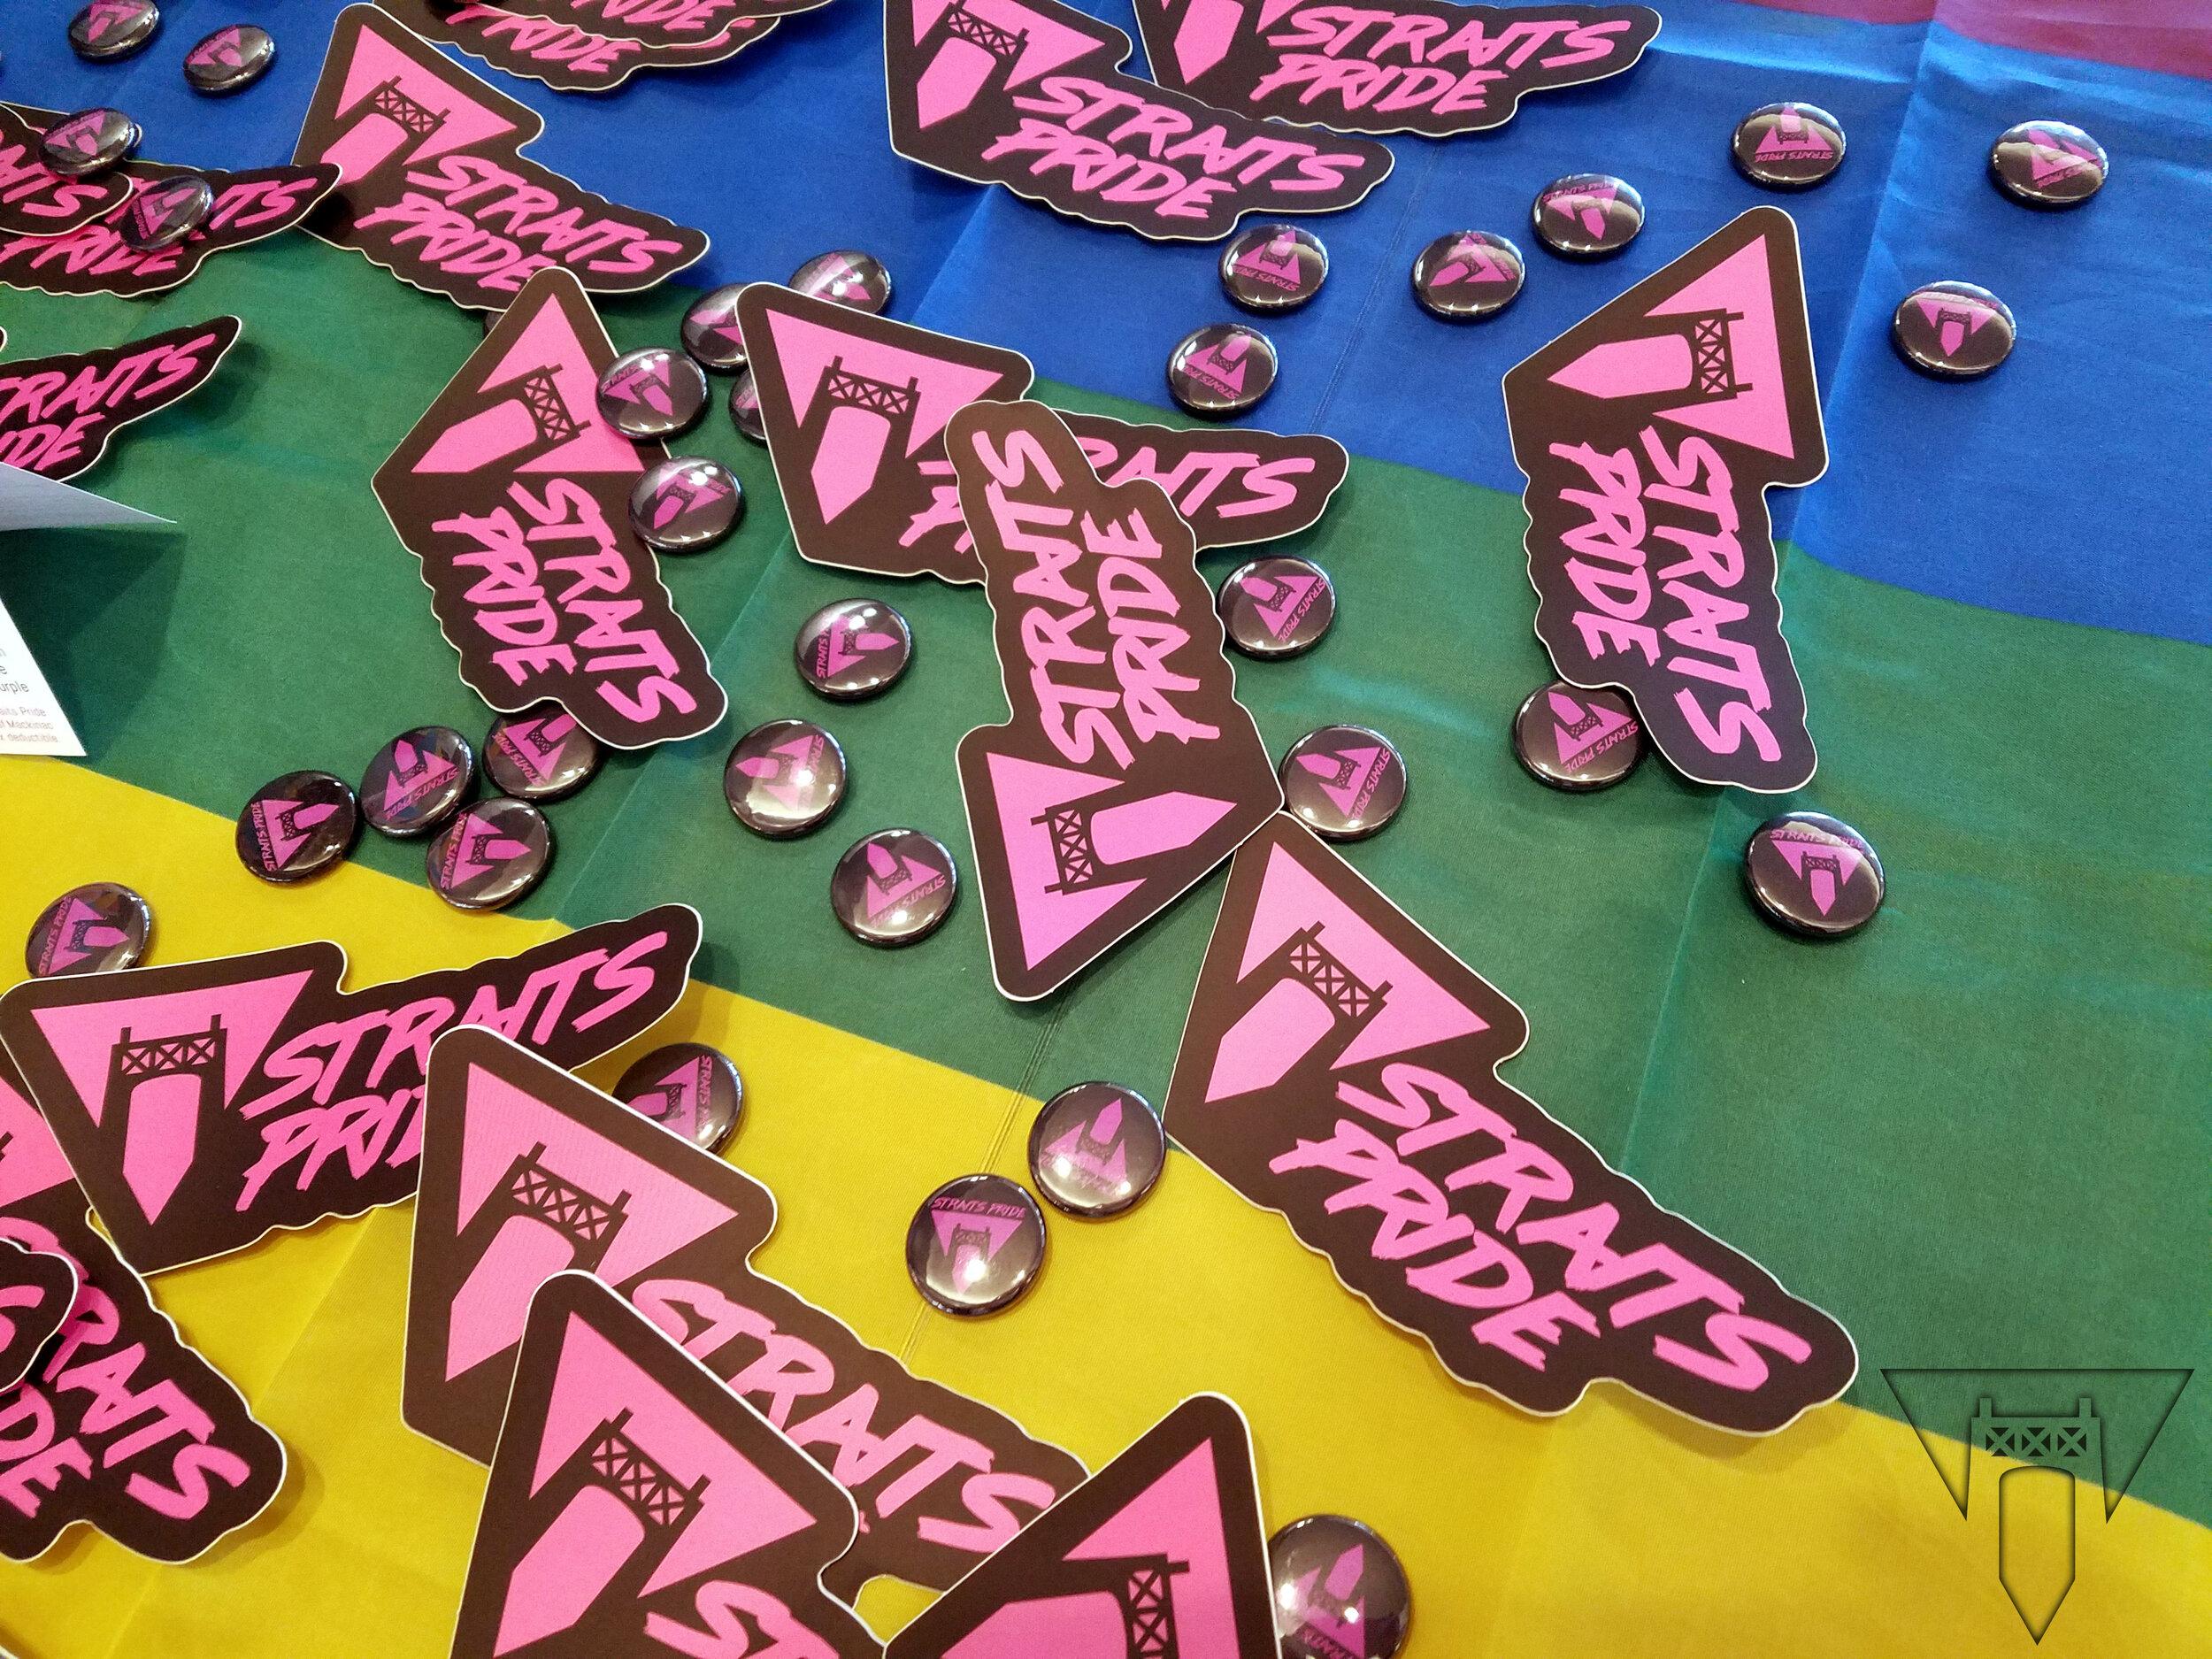 straits pride stickers.jpg